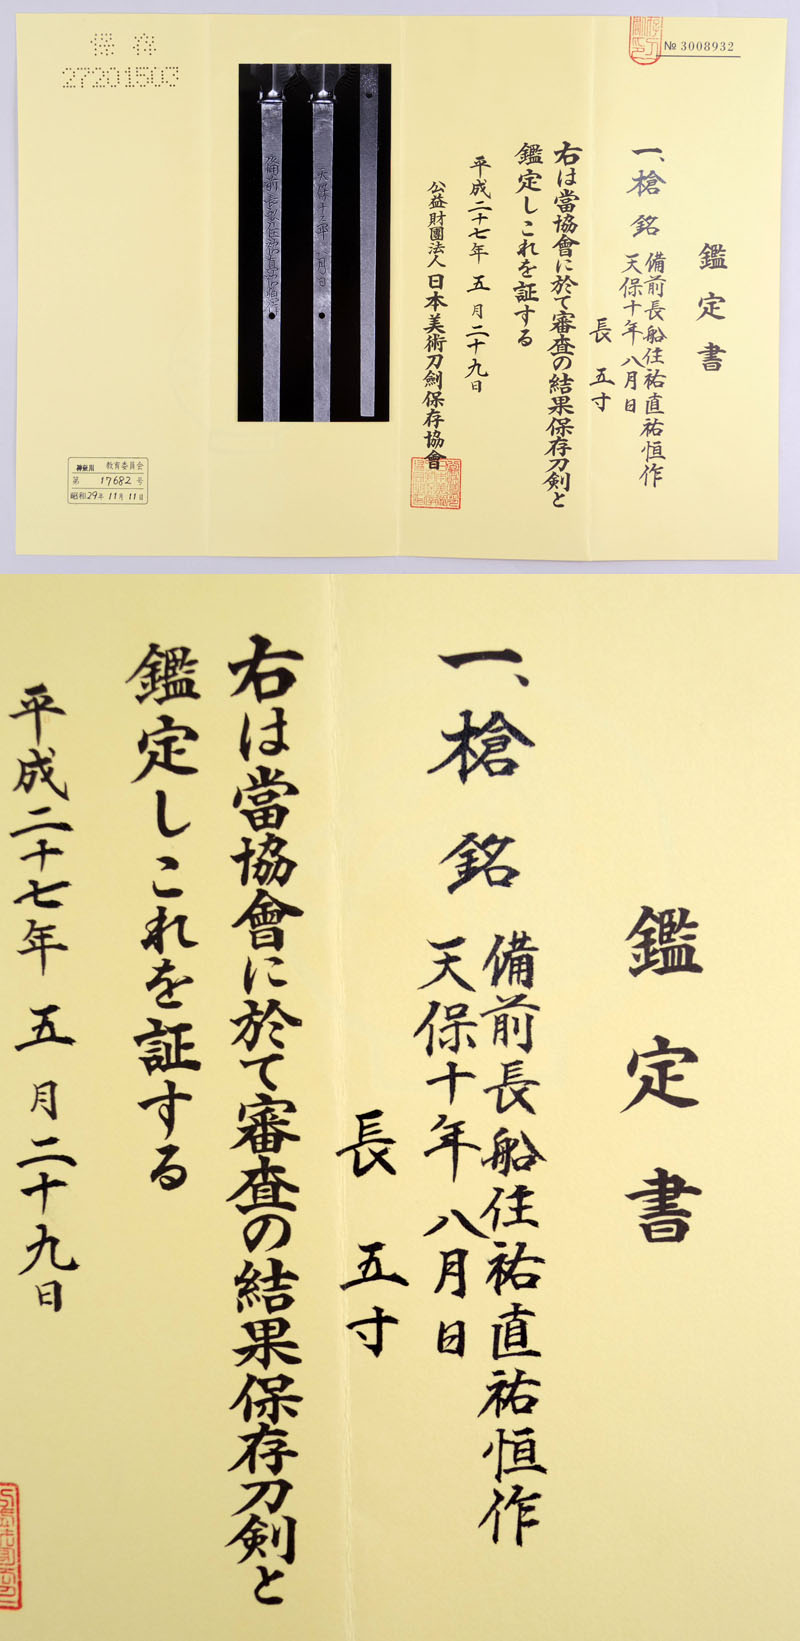 備前長船住祐直祐恒作(祐直 祐恒 親子の合作) Picture of Certificate